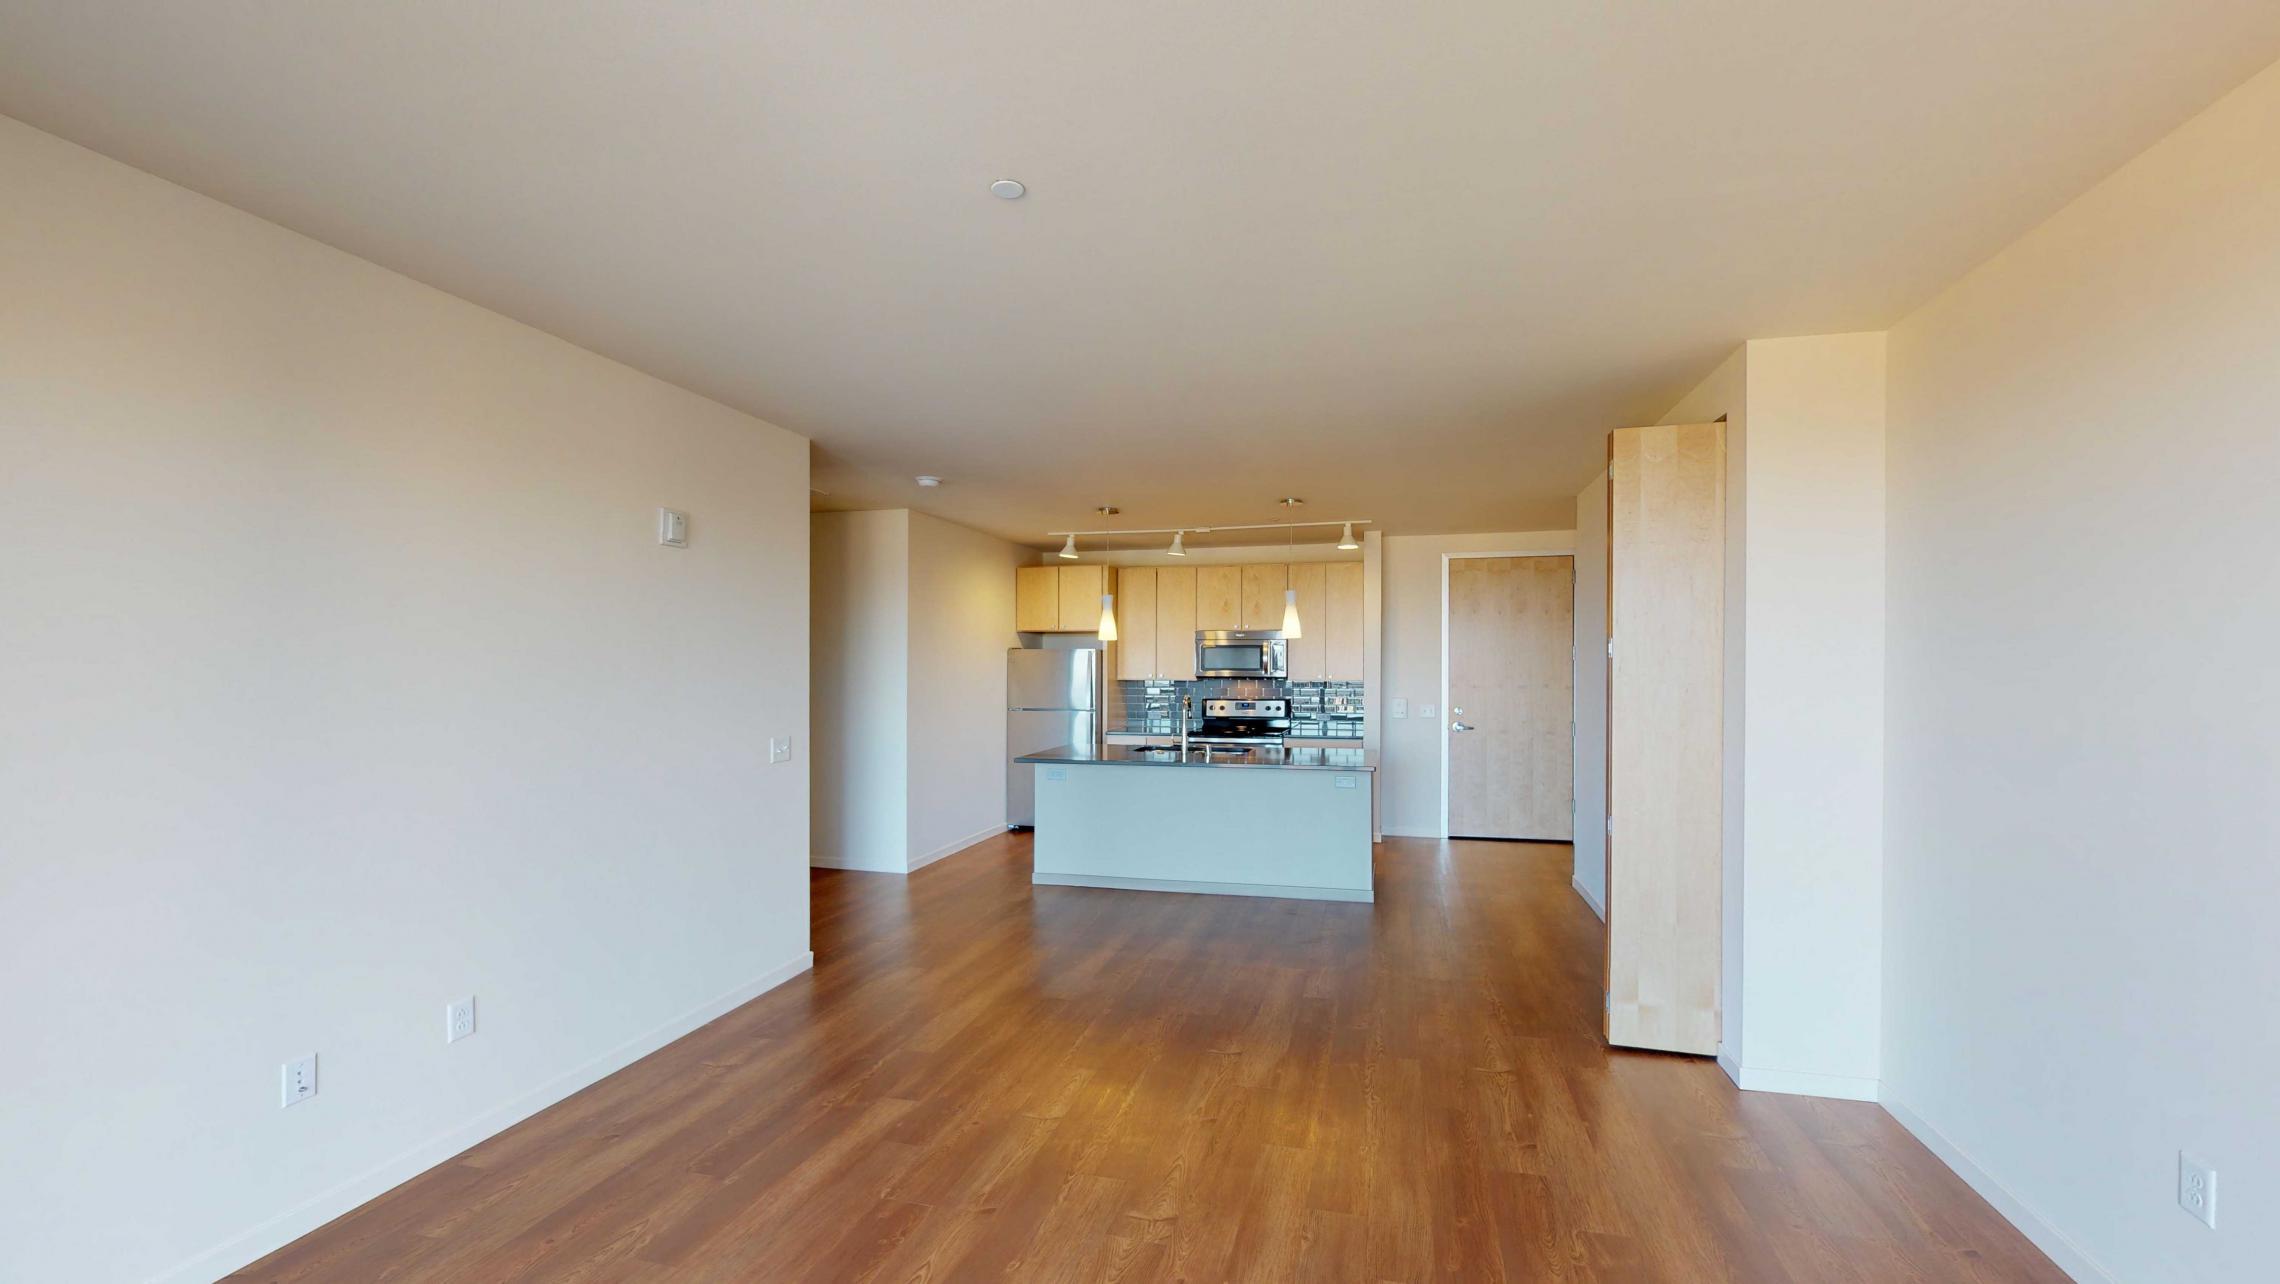 Nine-Line-Apartment-517-kitchen-appliances-moder-lake-view-downtown-captiol-madison-lifestyle-balcony.jpg